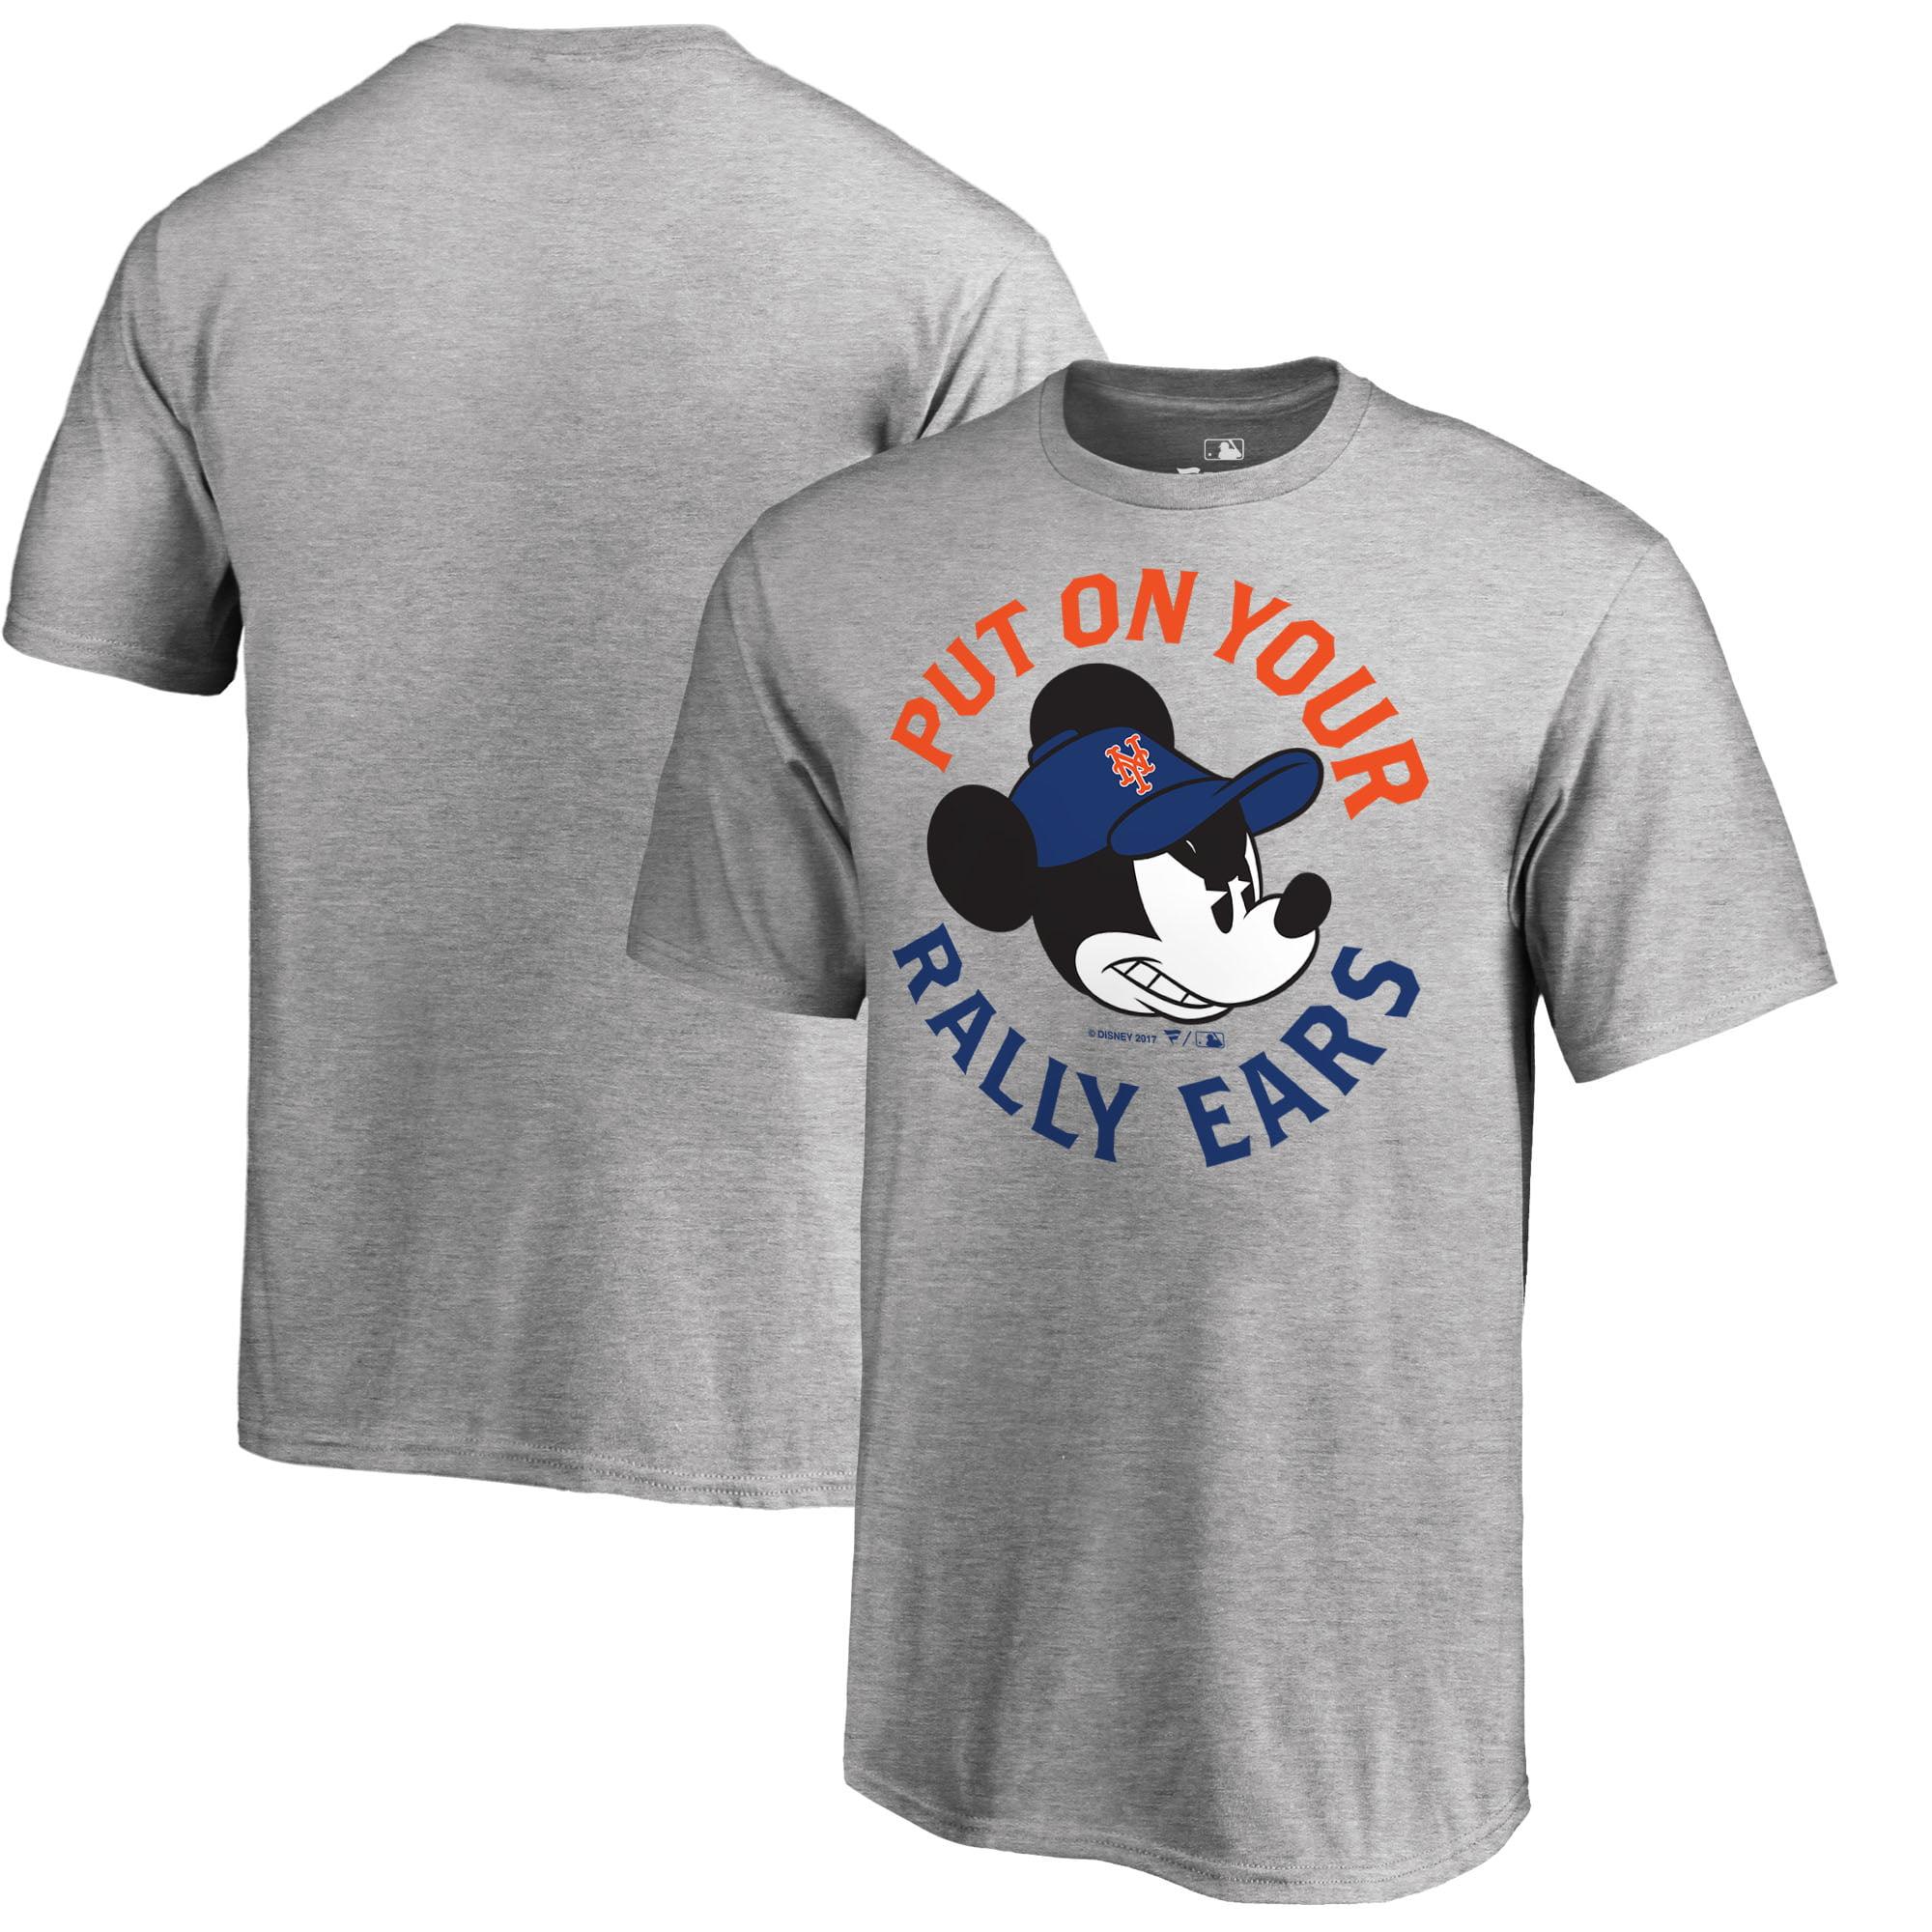 New York Mets Fanatics Branded Youth Disney Rally Ears T-Shirt - Heathered Gray